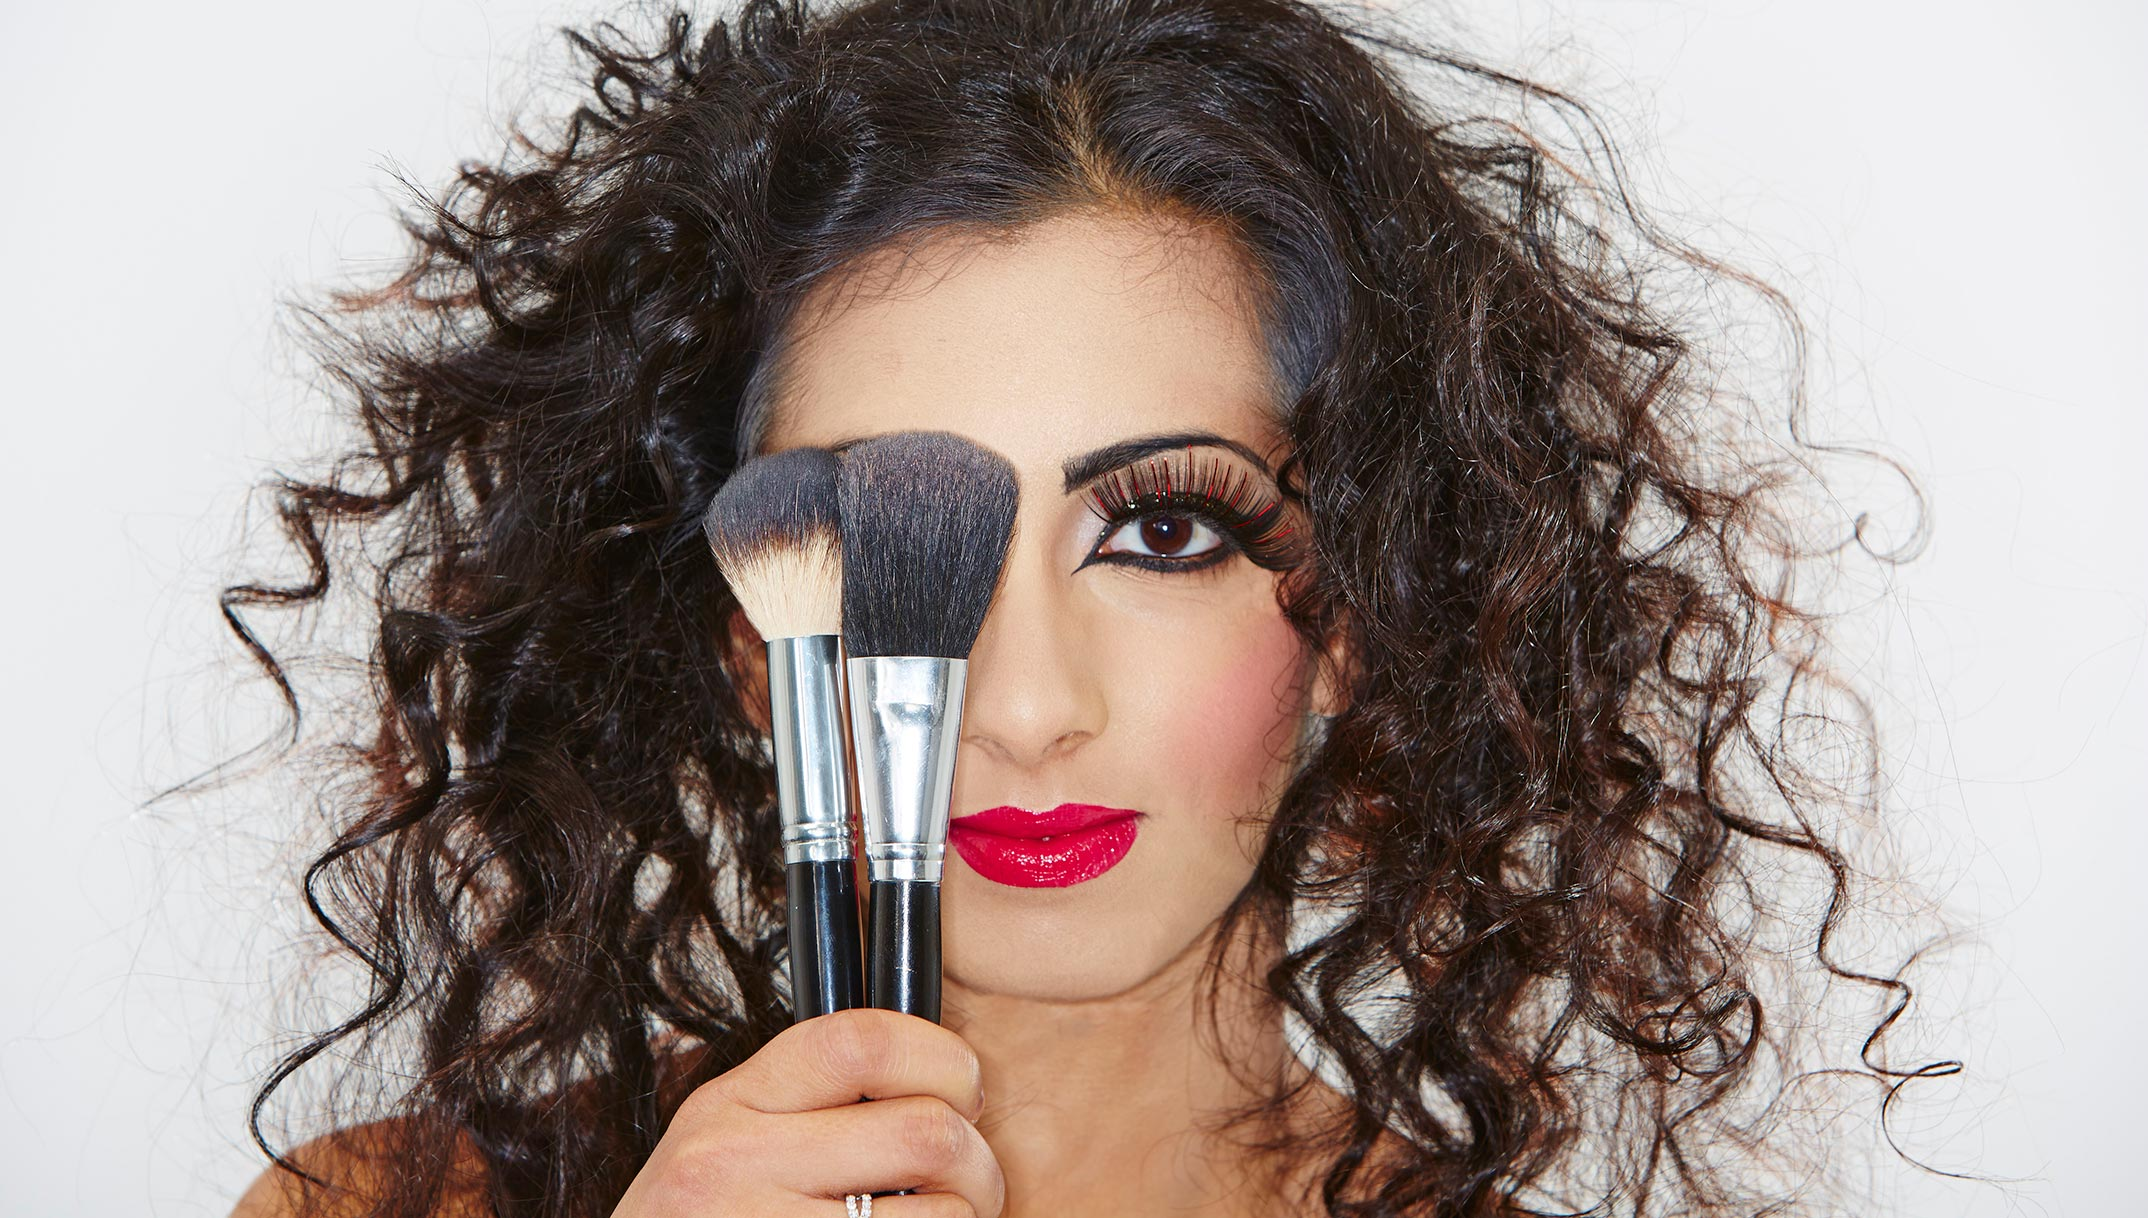 Make up arts shot by adrian forrest